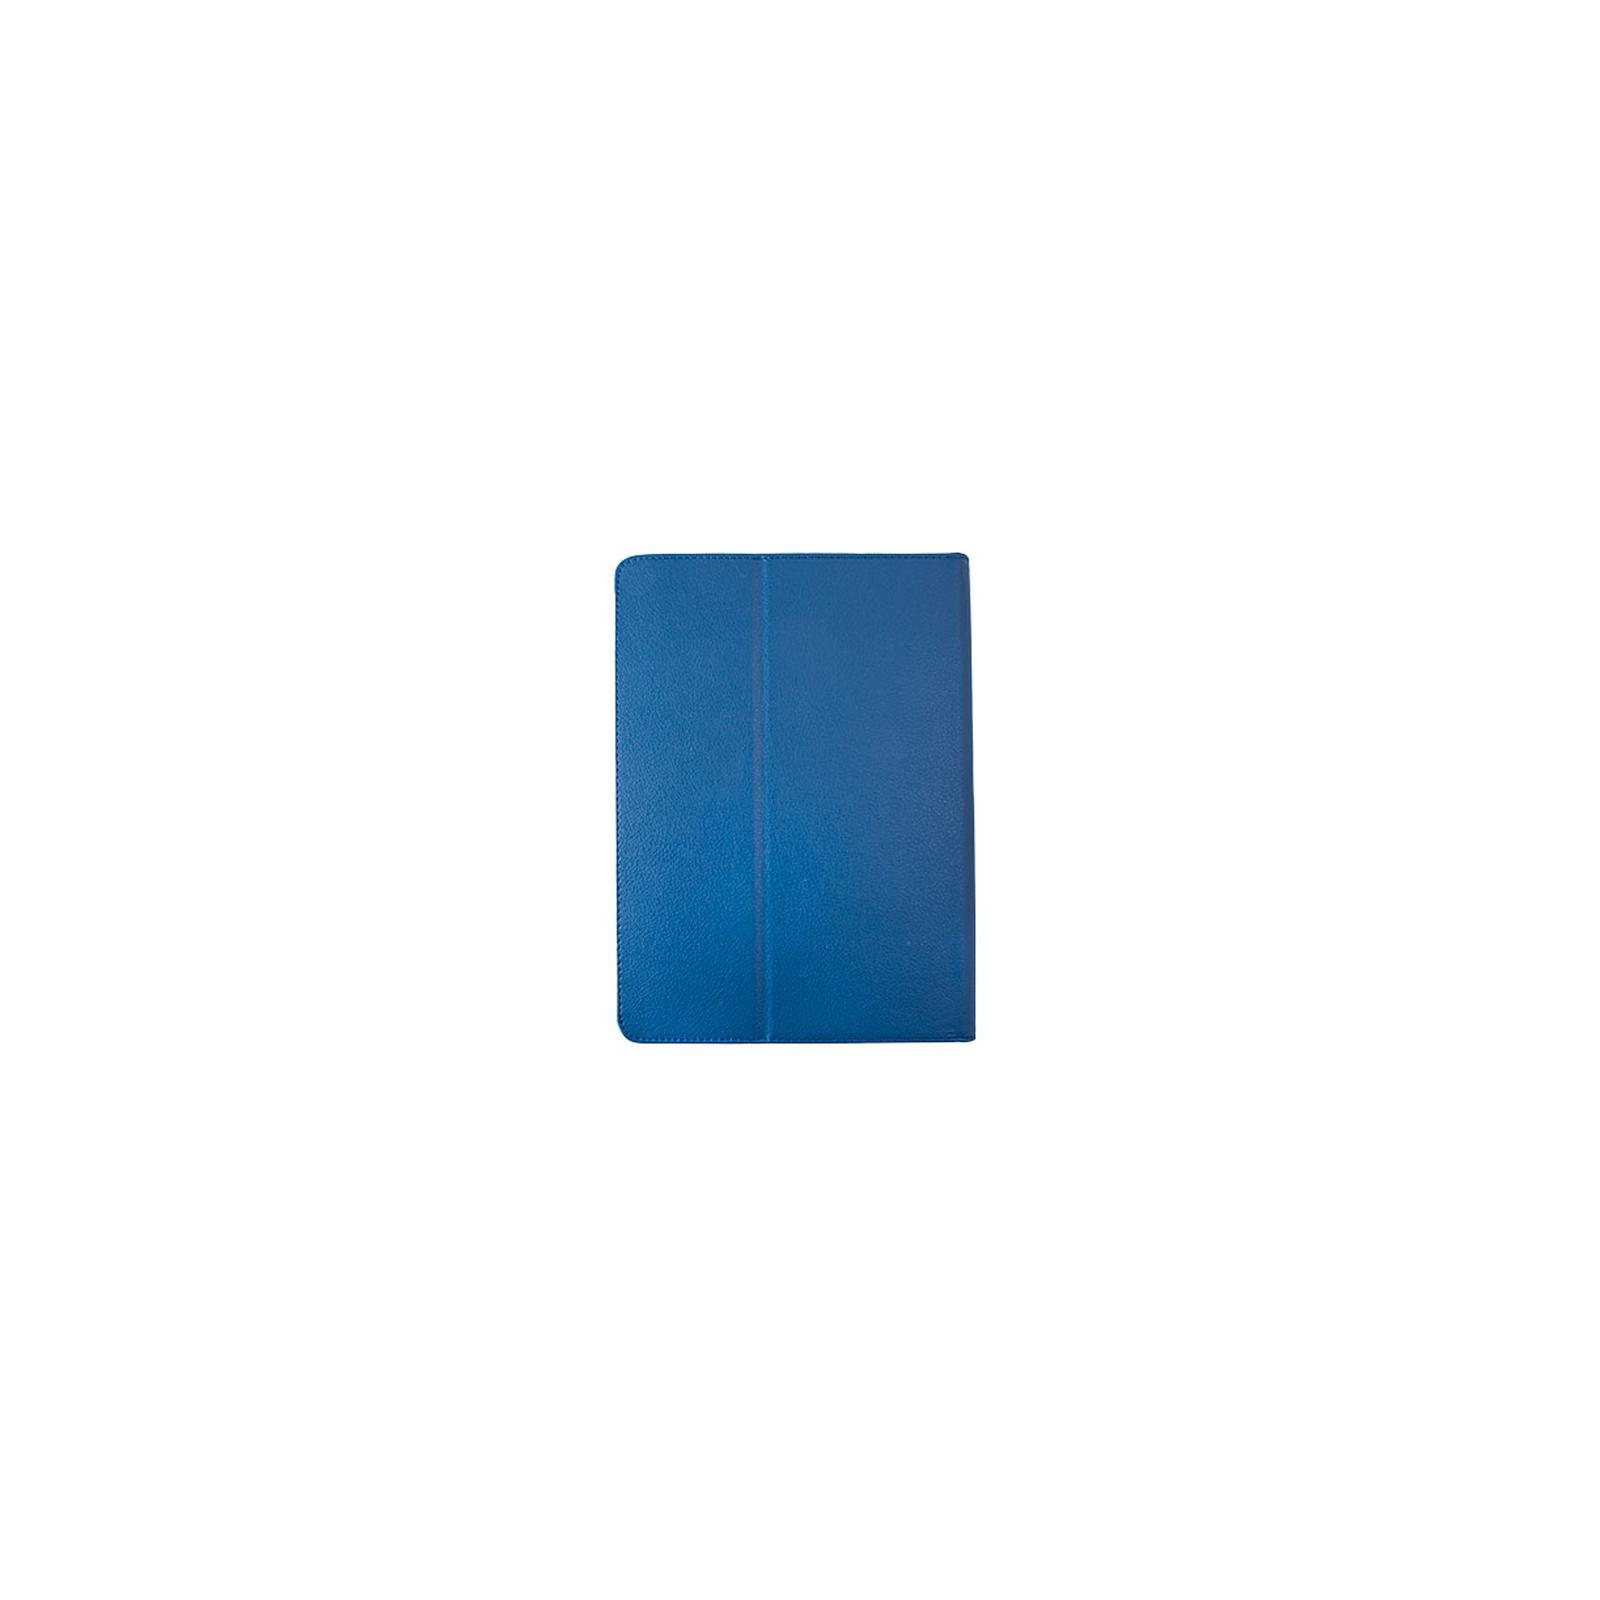 "Чехол для планшета Vellini 10-10,1"" Universal stand Dark Blue (216871) изображение 3"